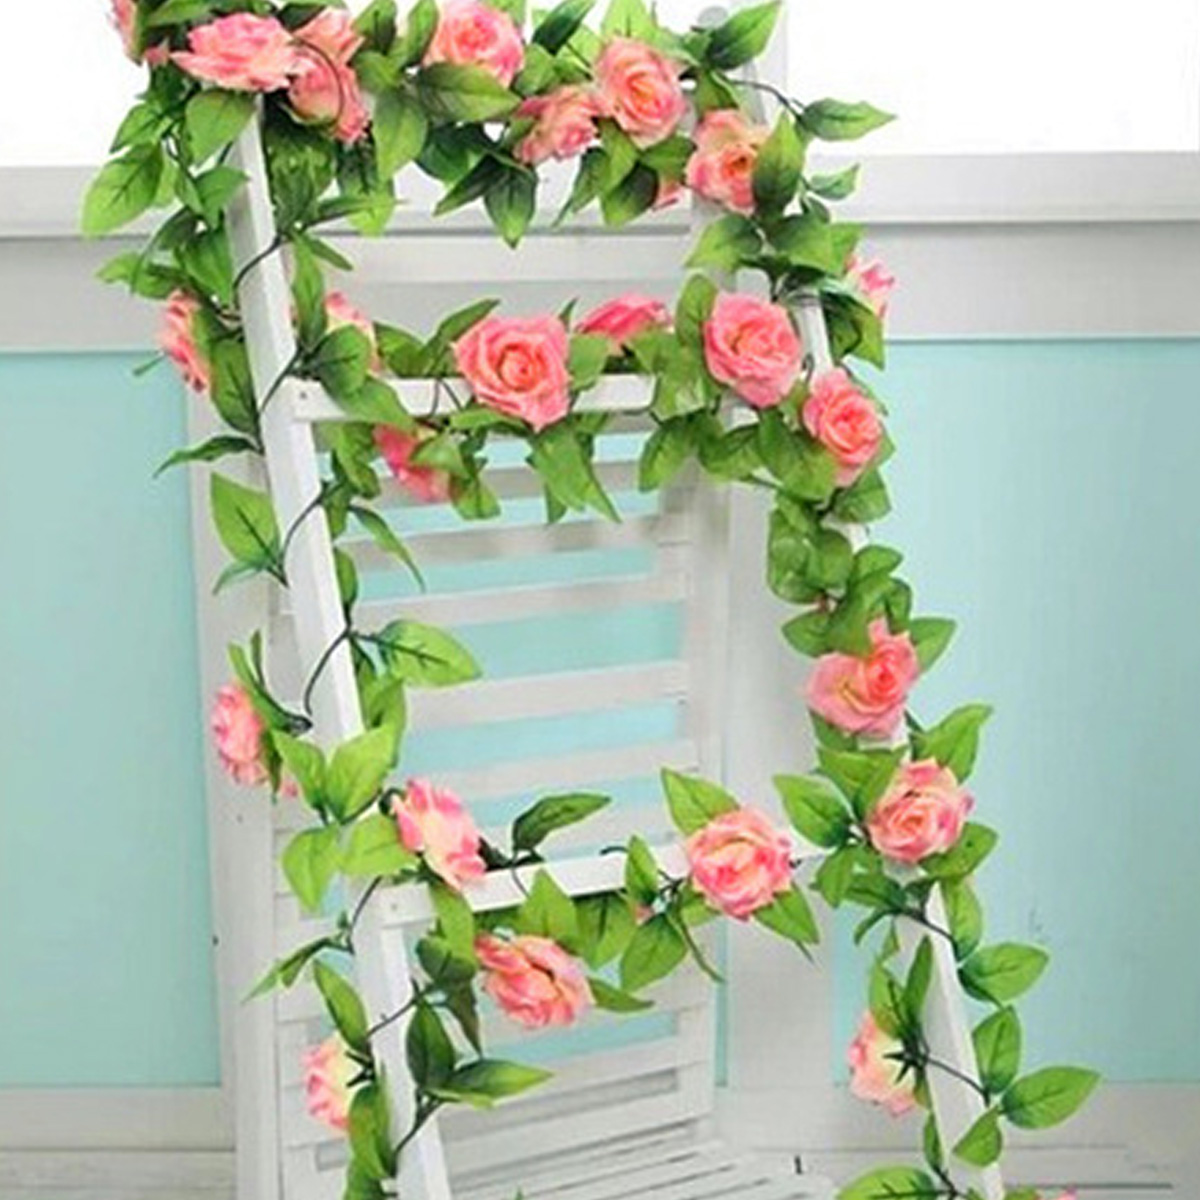 Home Decor Hanging Garland Fake Ivy Vine Silk Sunflower Artificial Flowers